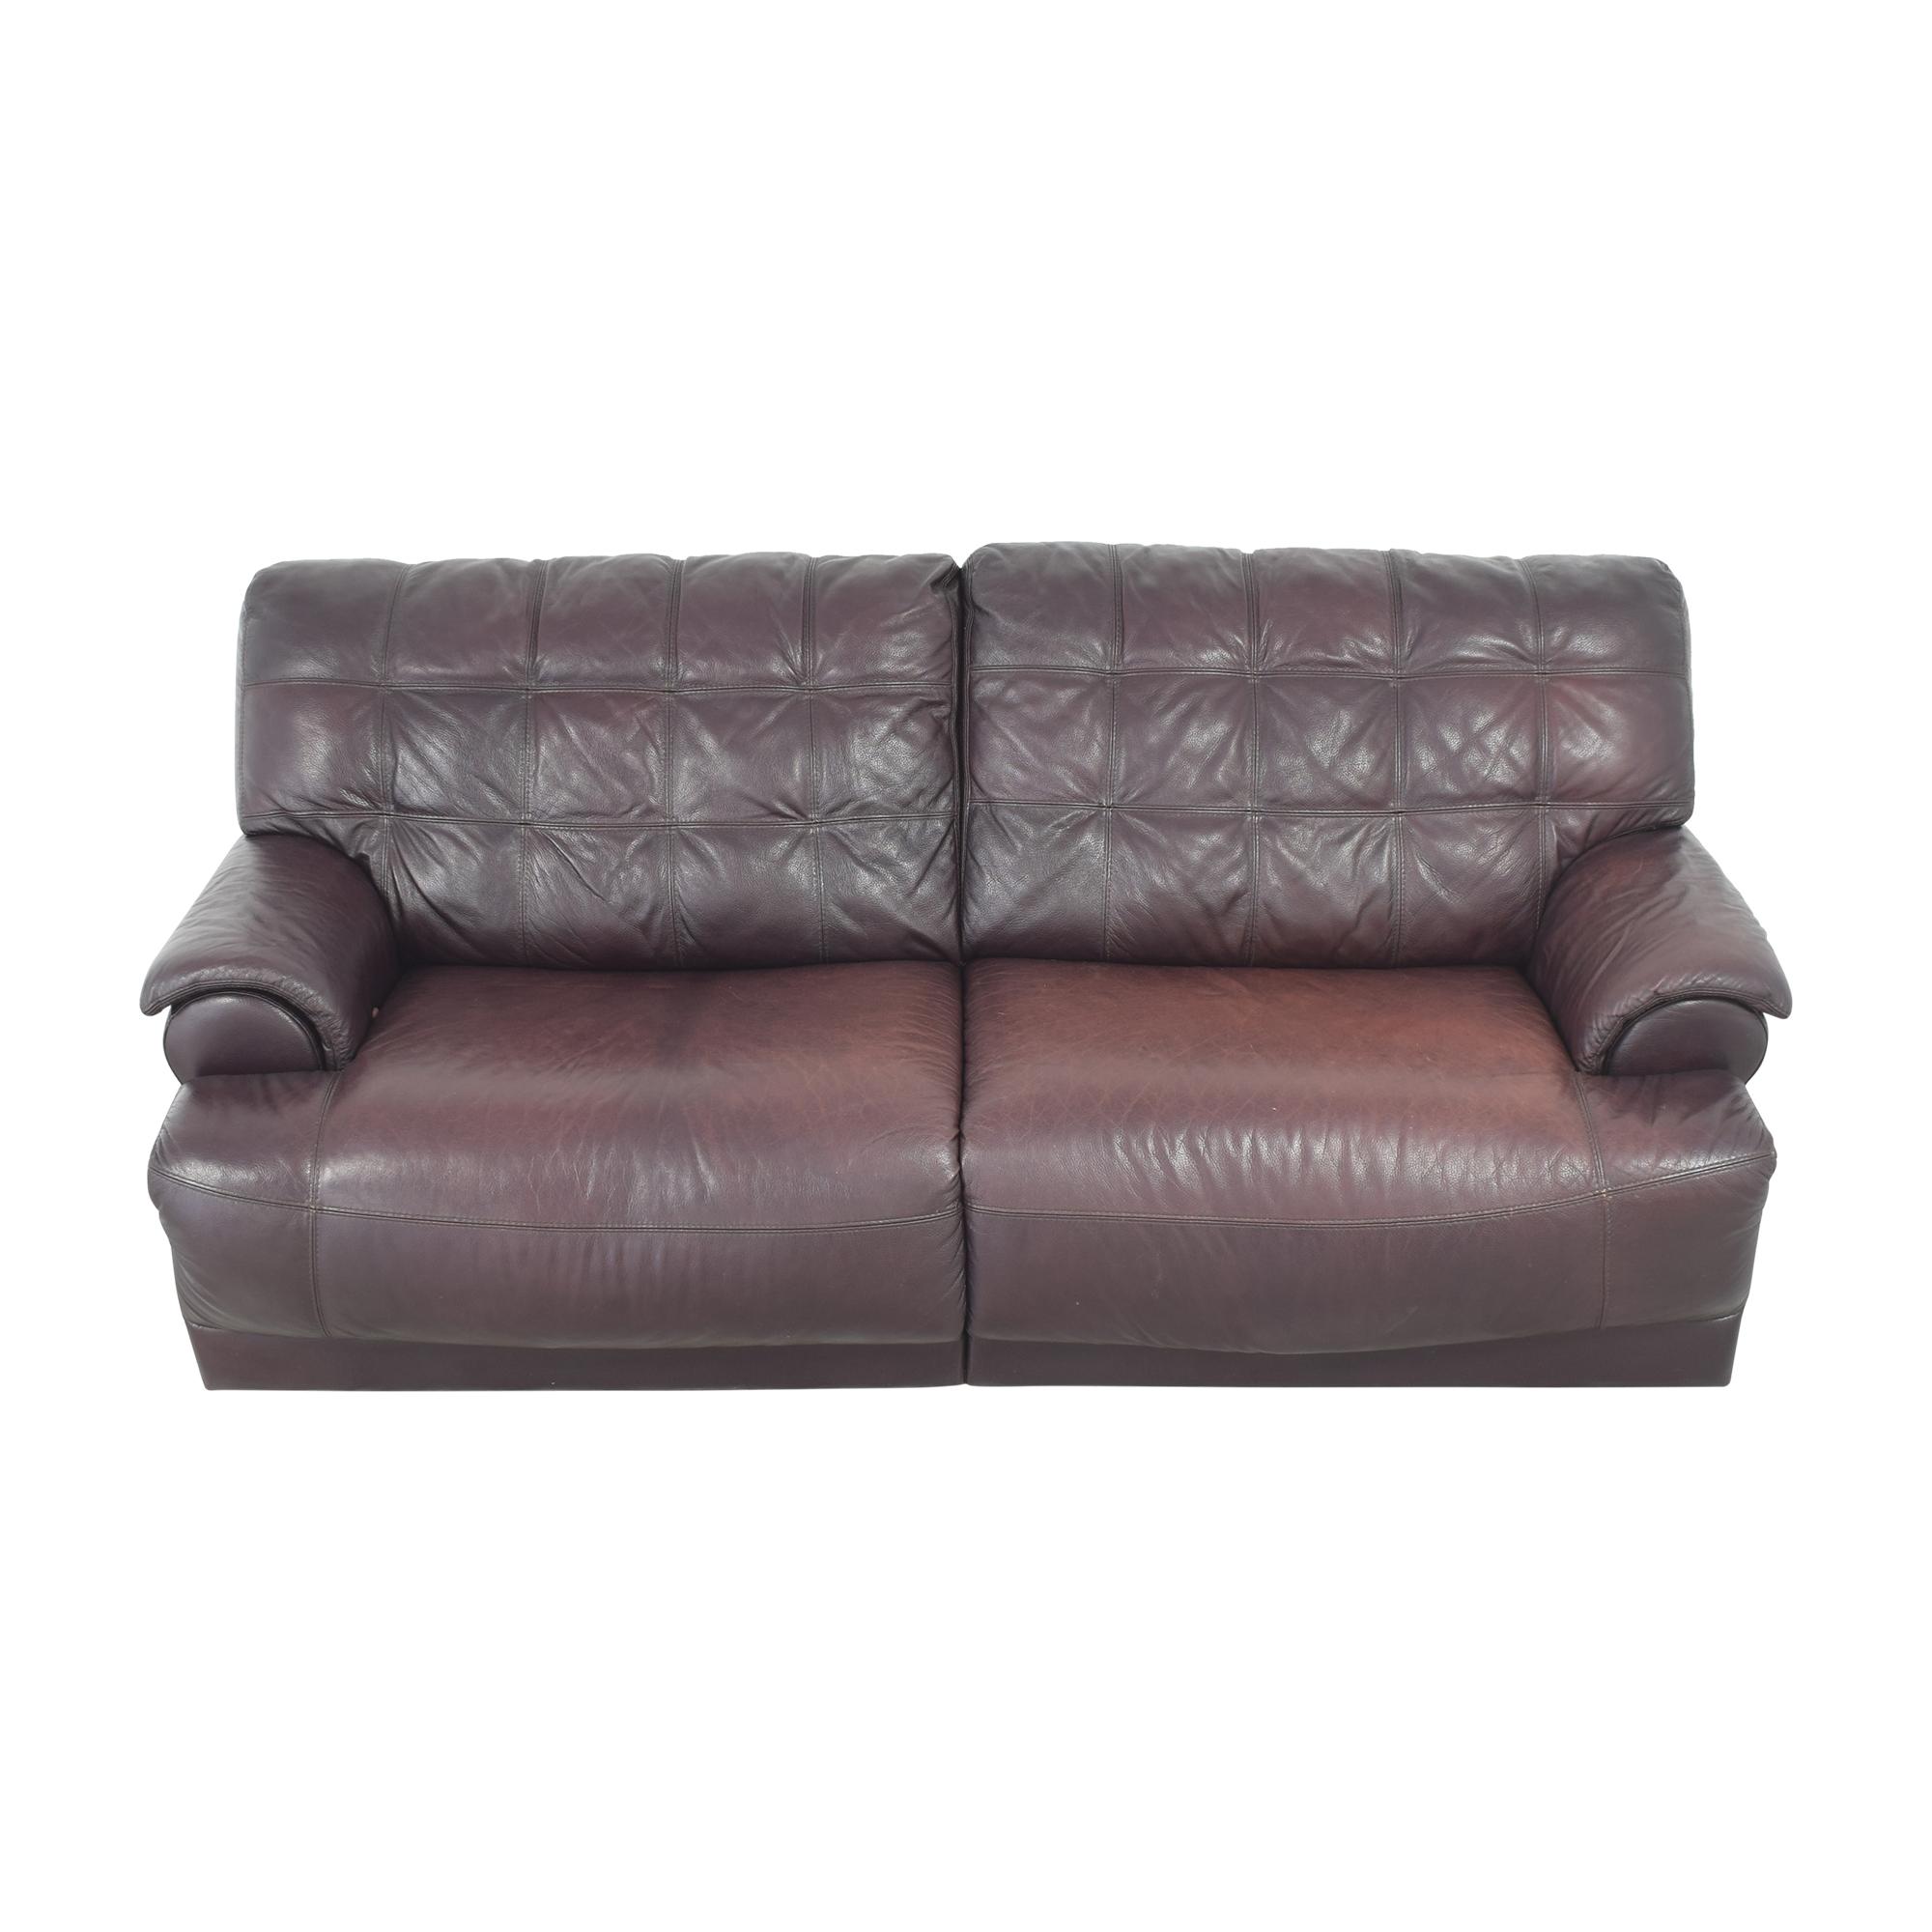 Macy's Two Cushion Reclining Sofa / Sofas